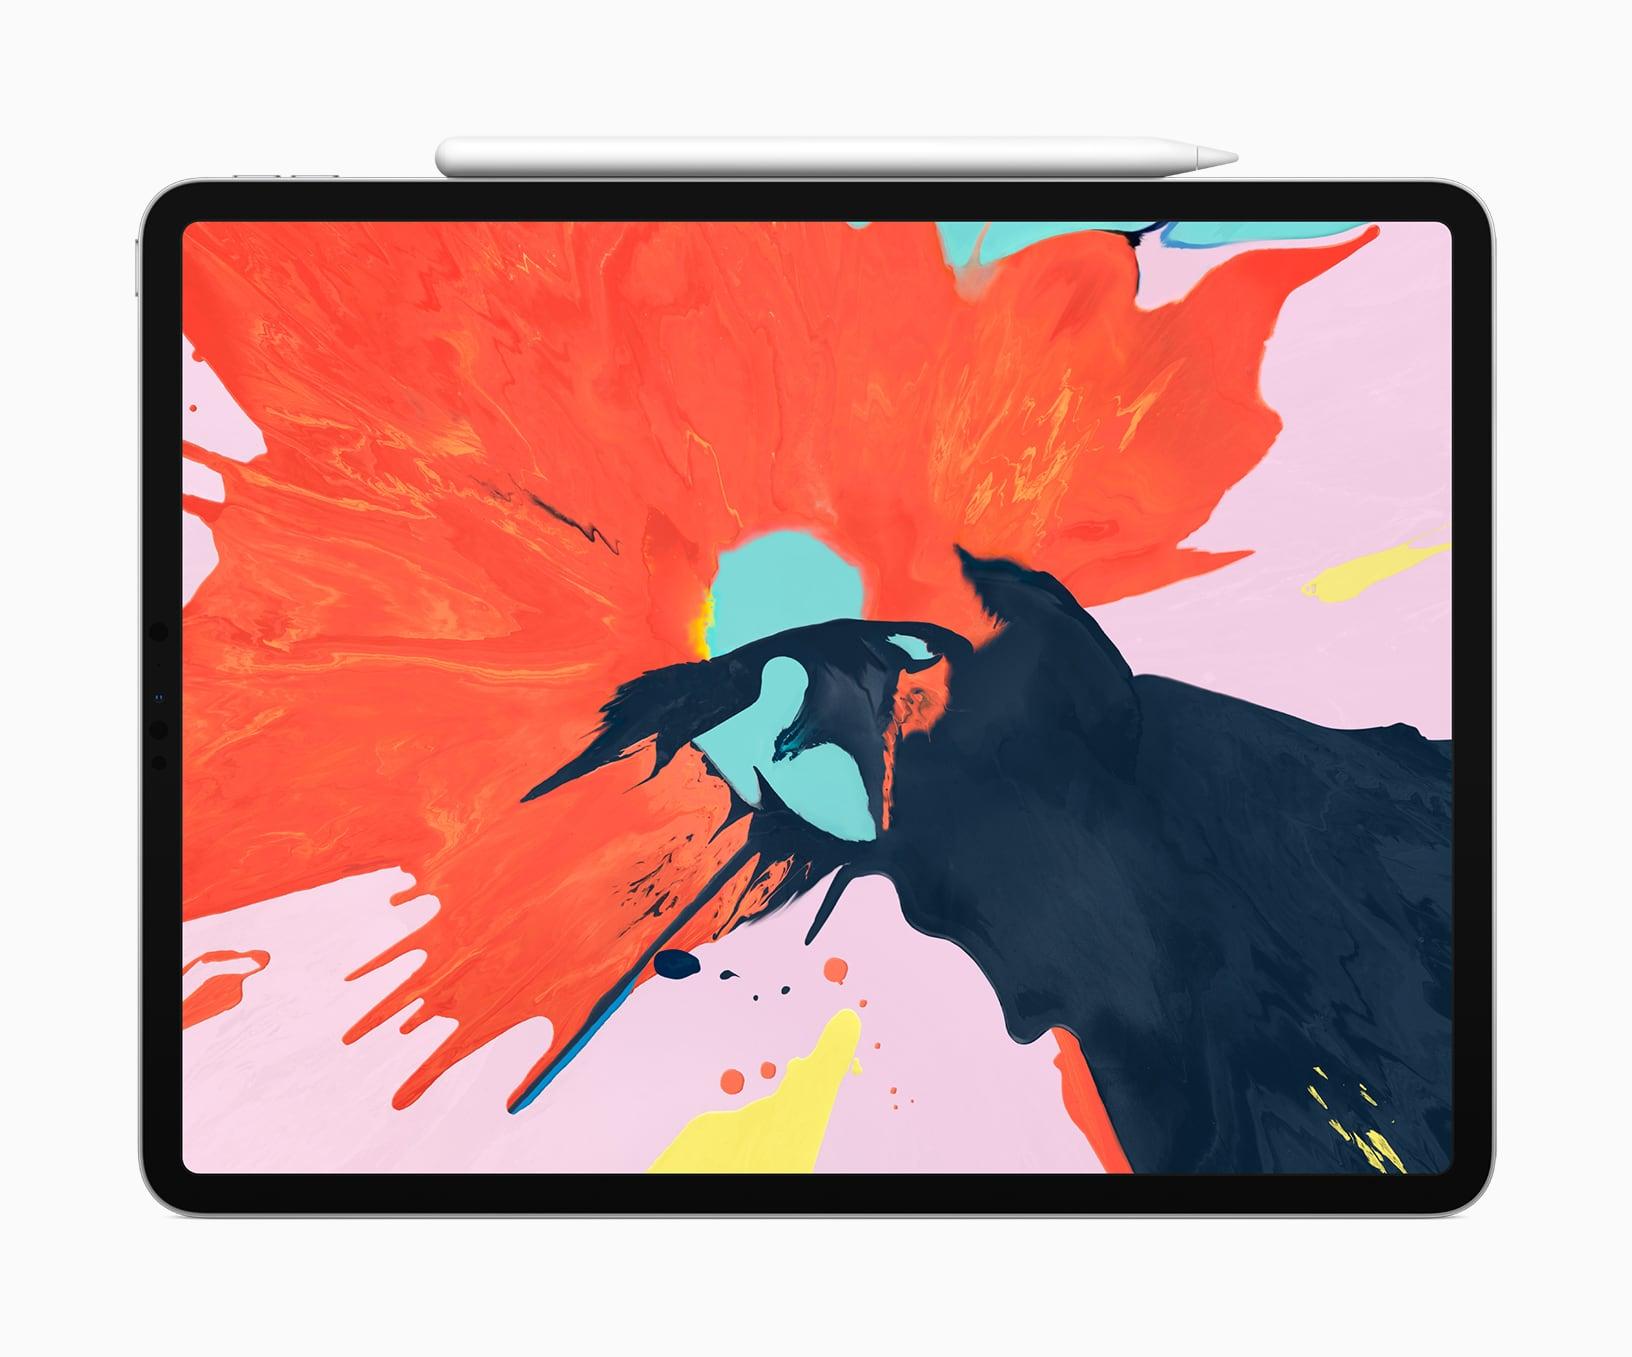 new Apple iPad Pro and Apple Pencil